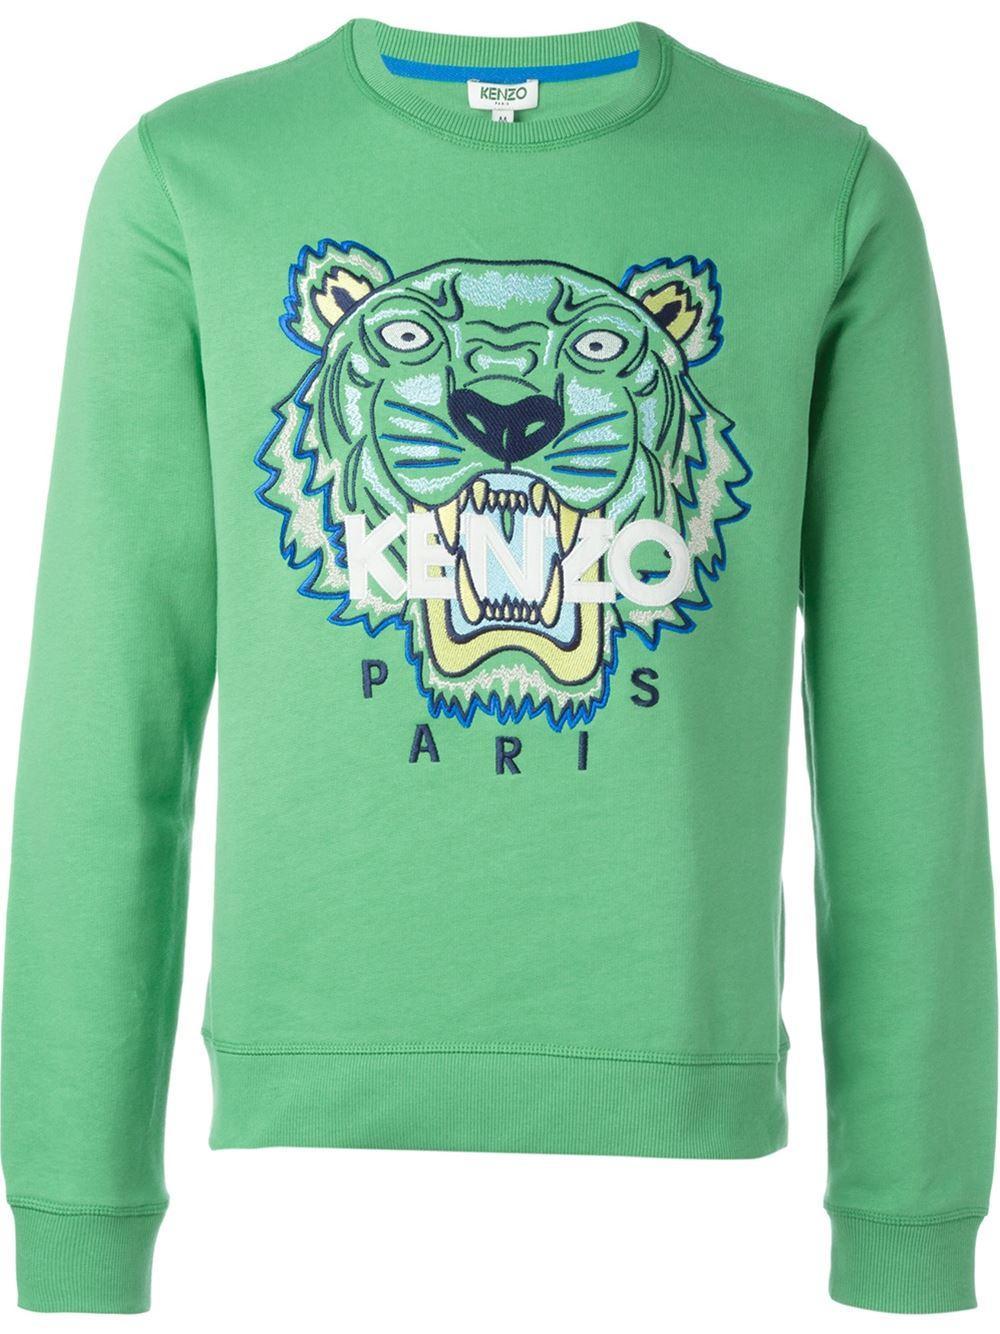 ec7148828 KENZO 'tiger' Sweatshirt in Green for Men - Lyst